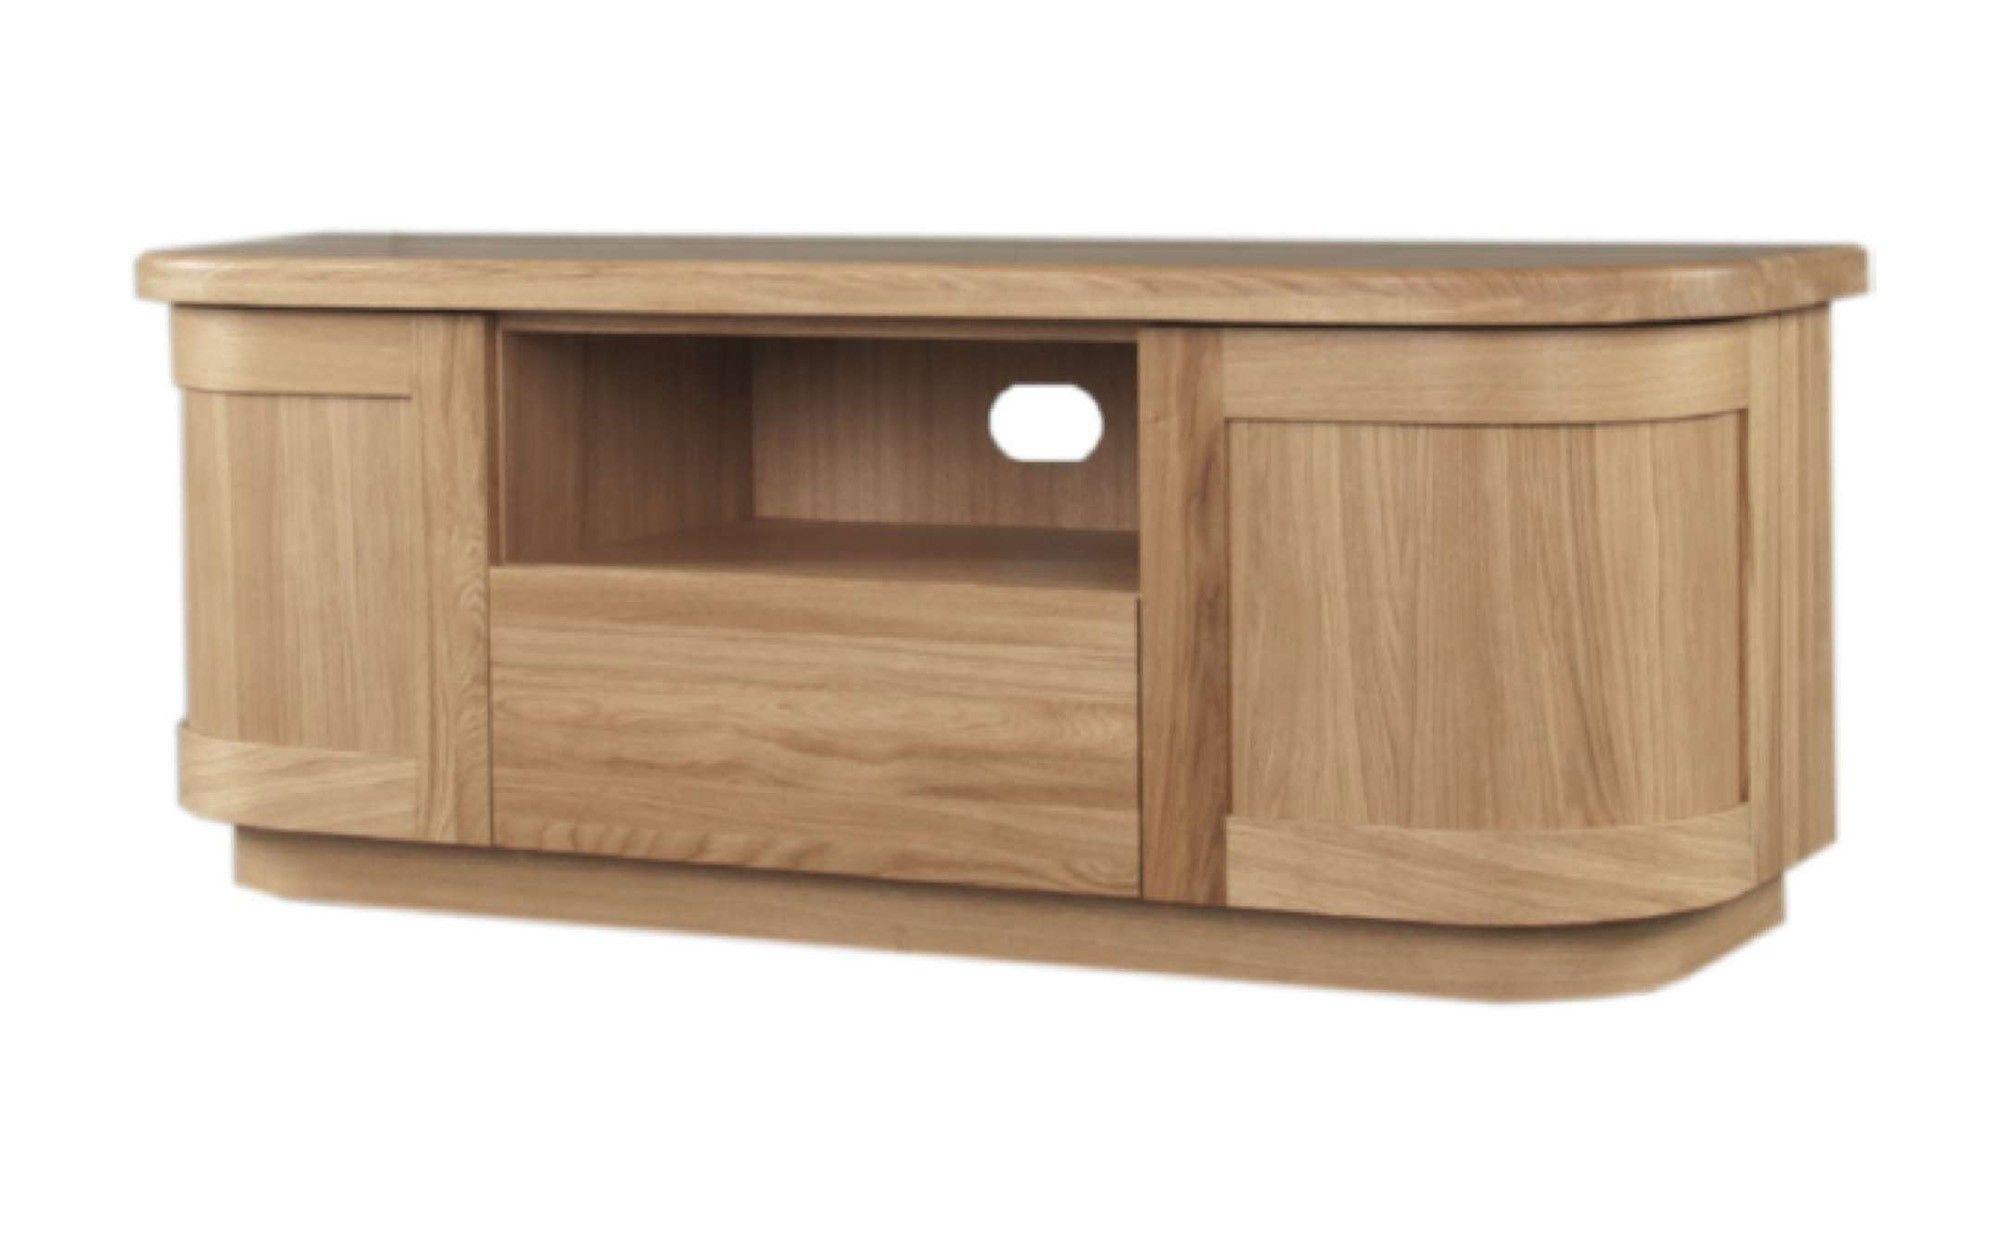 Sorento Solid Oak Tv Unit Kontenta Oak Furniture Pinterest  # Muebles Sorento